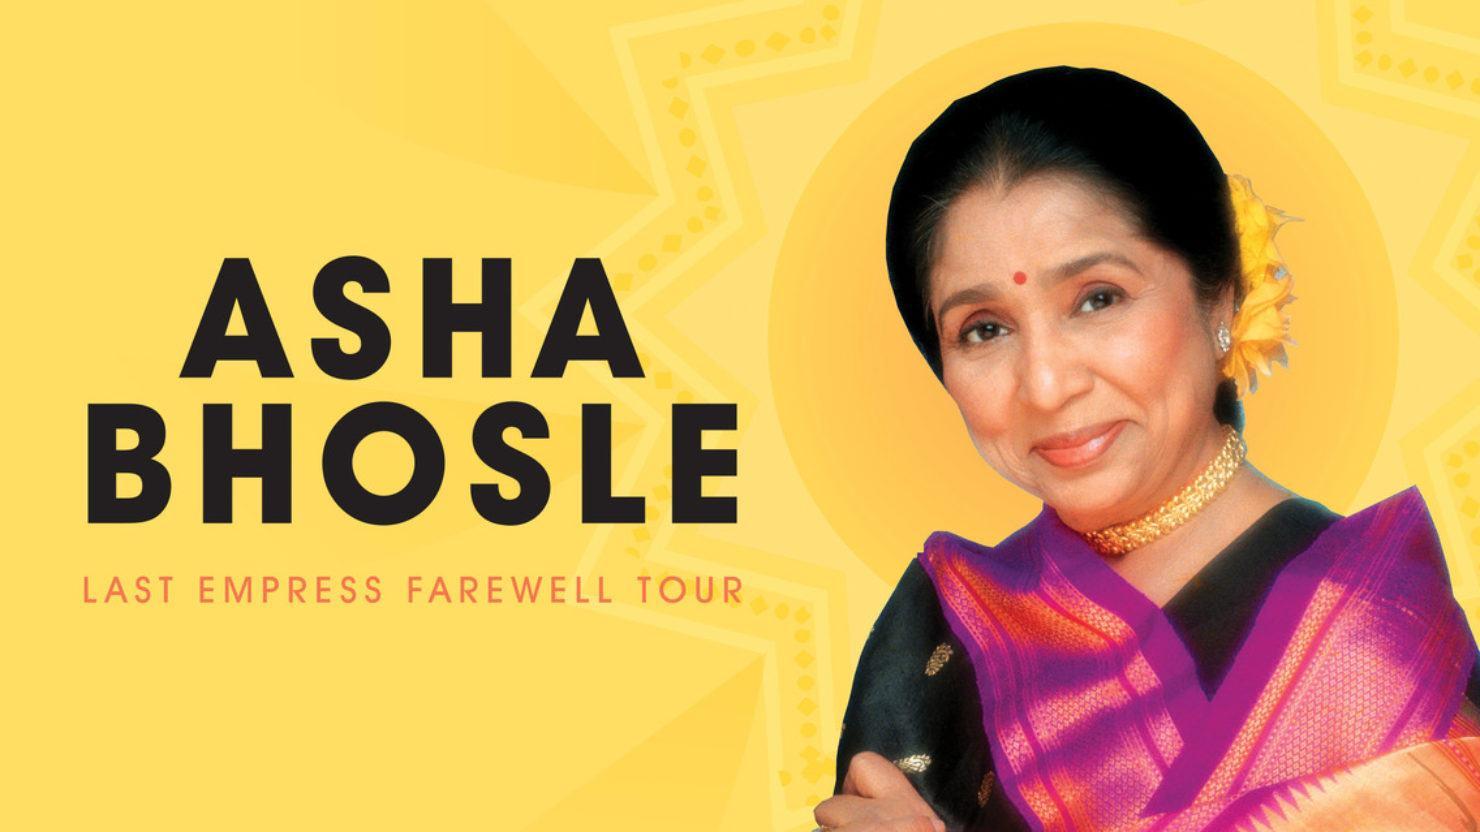 asha bhosle Unlimited free asha bhosle music - click to play dum maro dum, ina mina dika and whatever else you want.